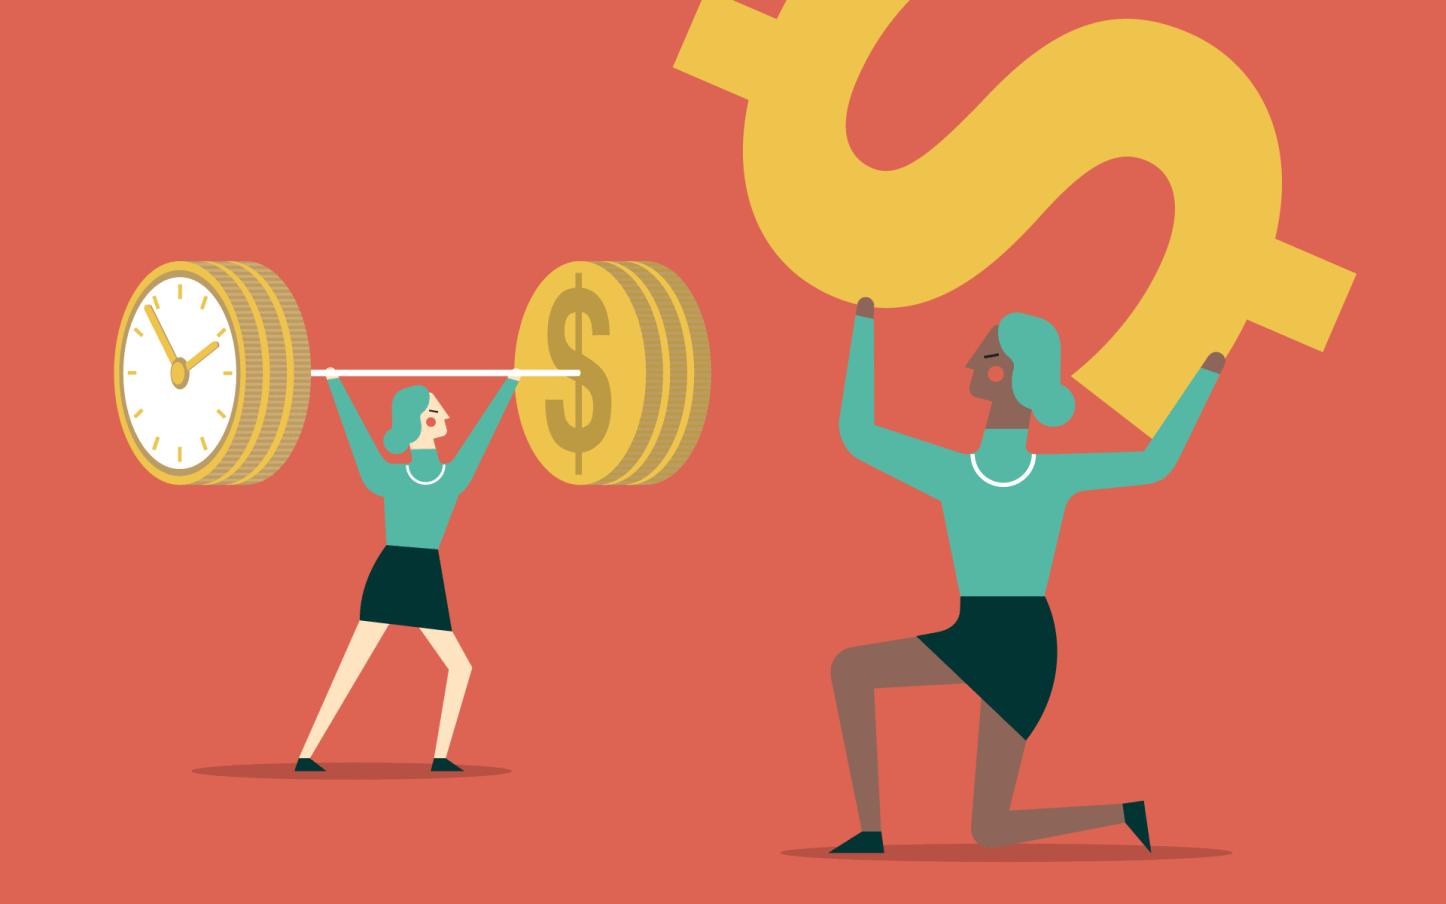 illustration of dollars